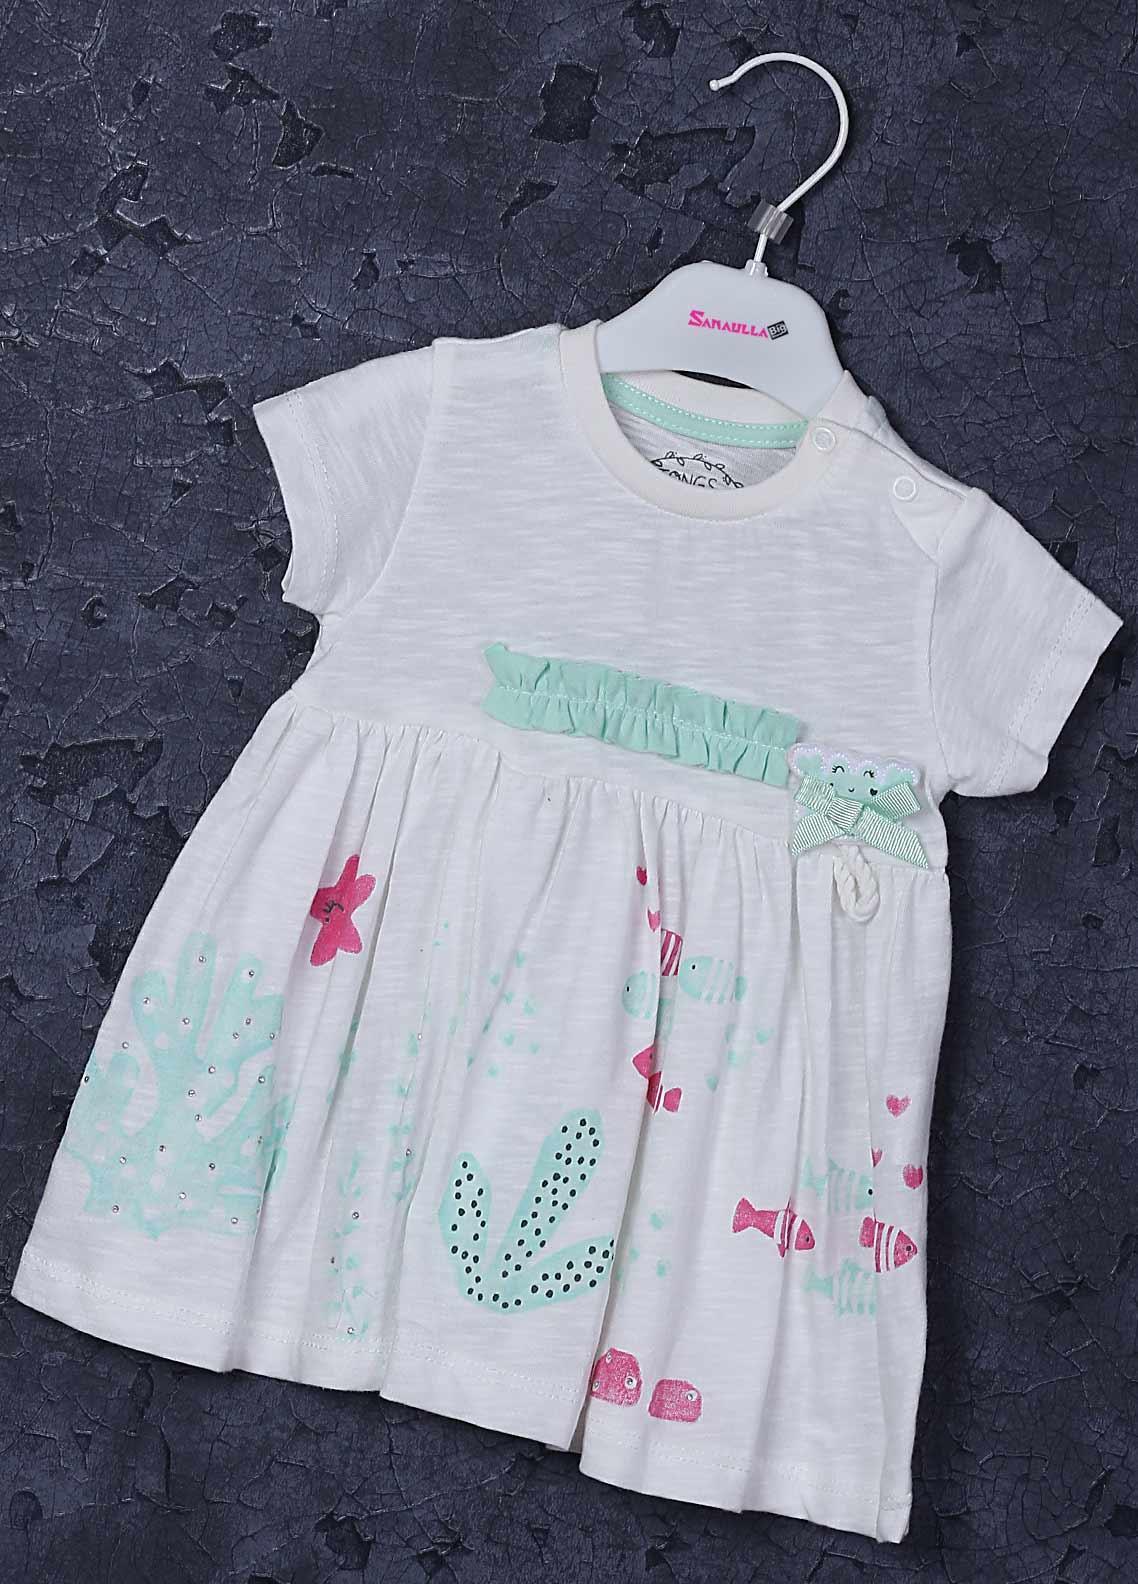 Sanaulla Exclusive Range Cotton Fancy Frocks for Girls -  2246 Off White